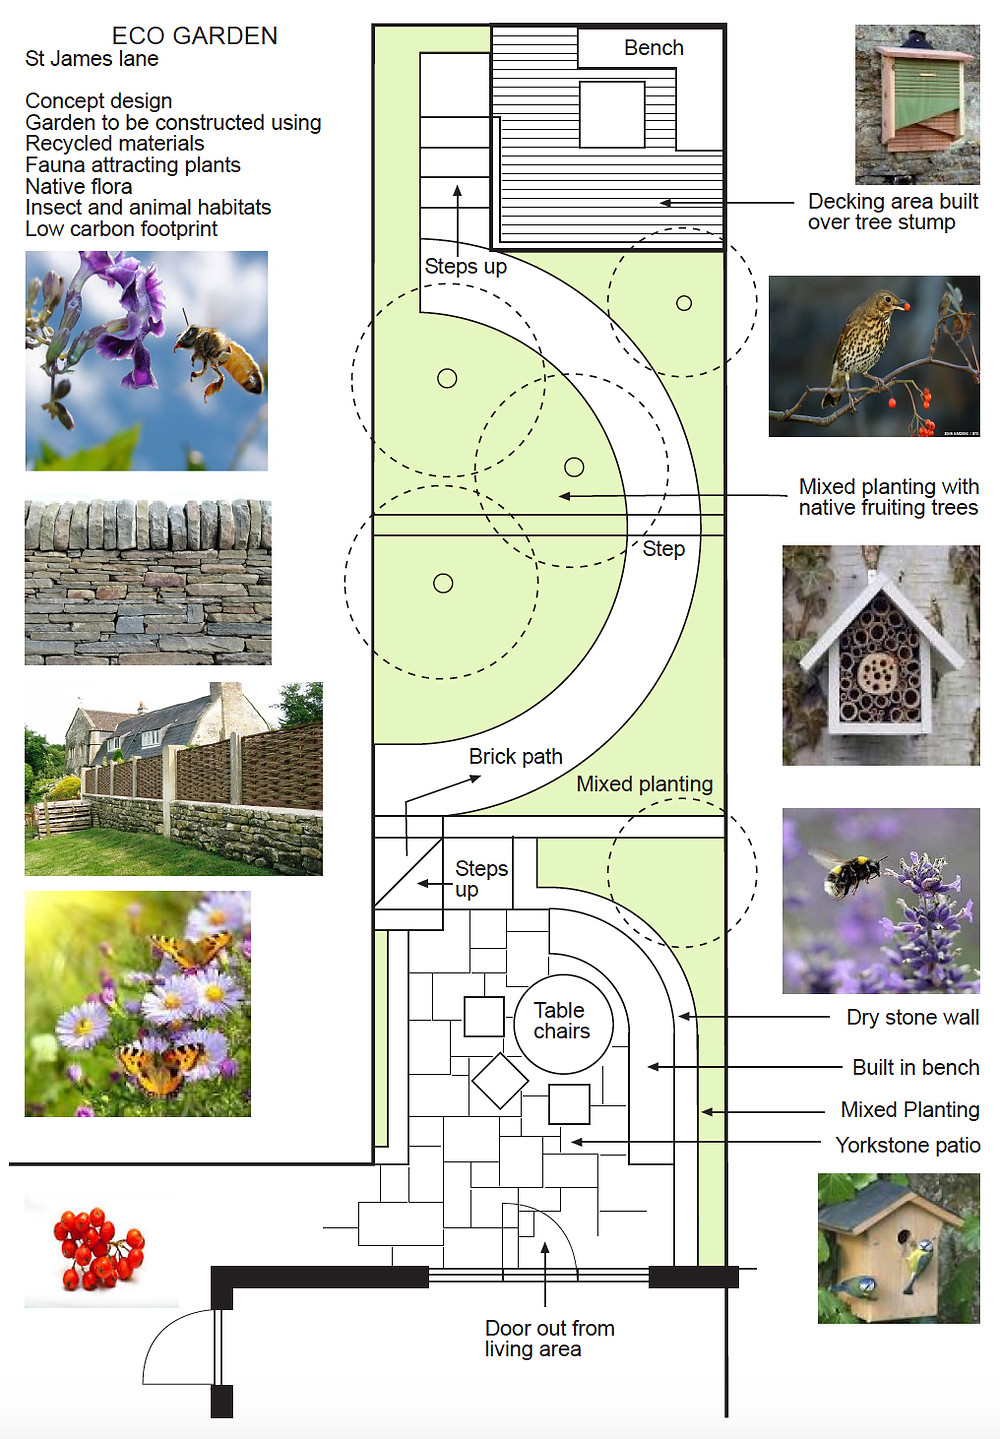 Eco Garden Design Back Garden Muswell Hill, London, N10